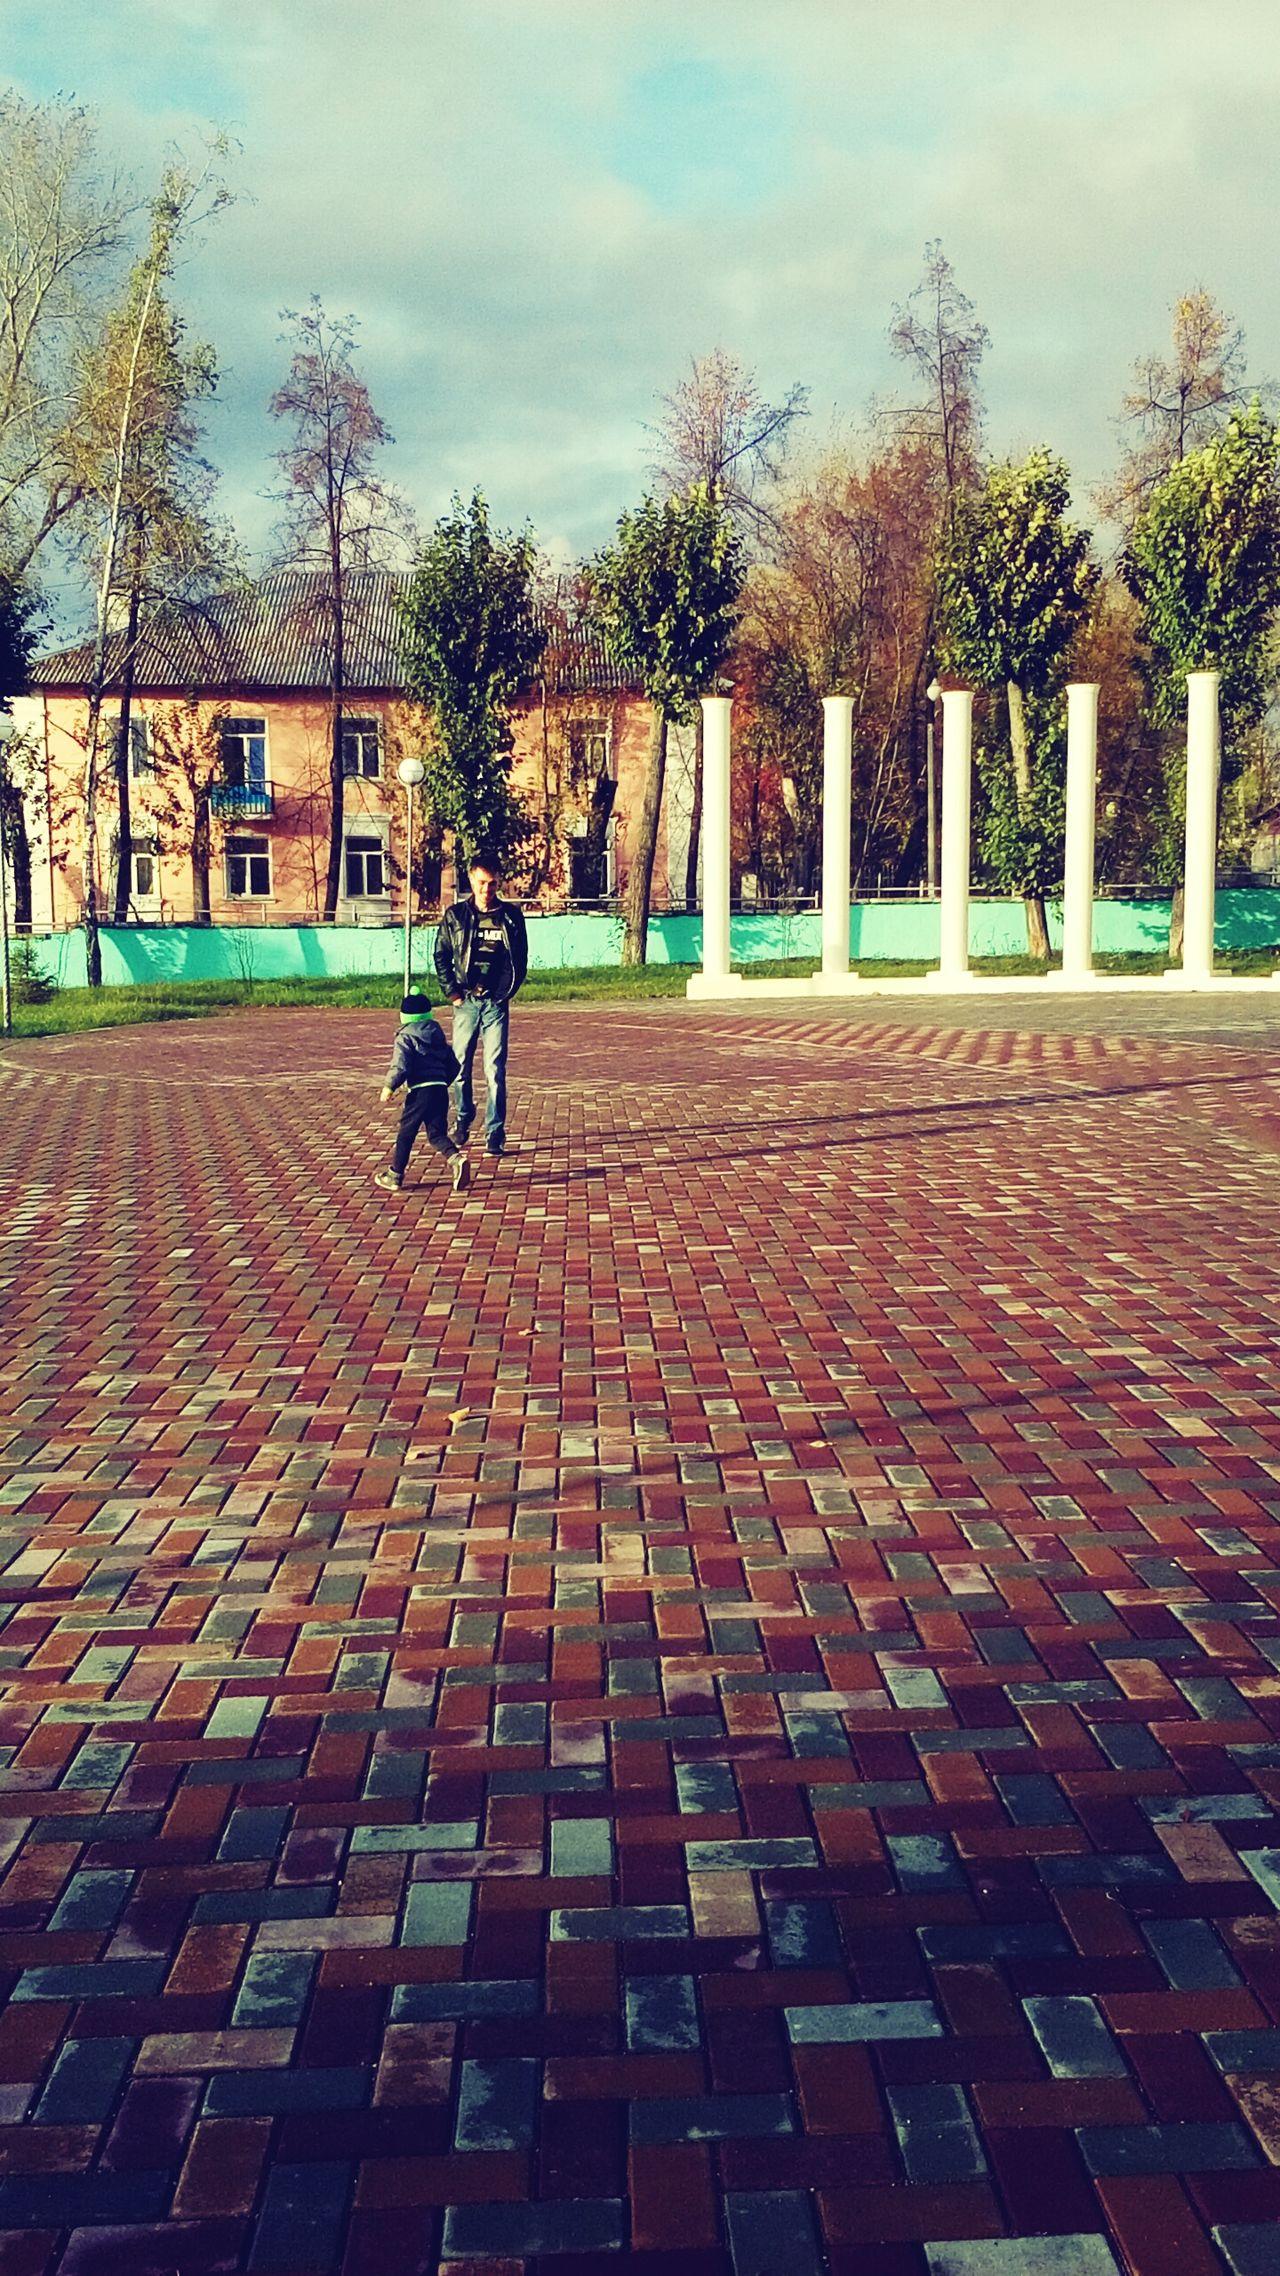 Day Sky площадь парклюбви ребенок осень